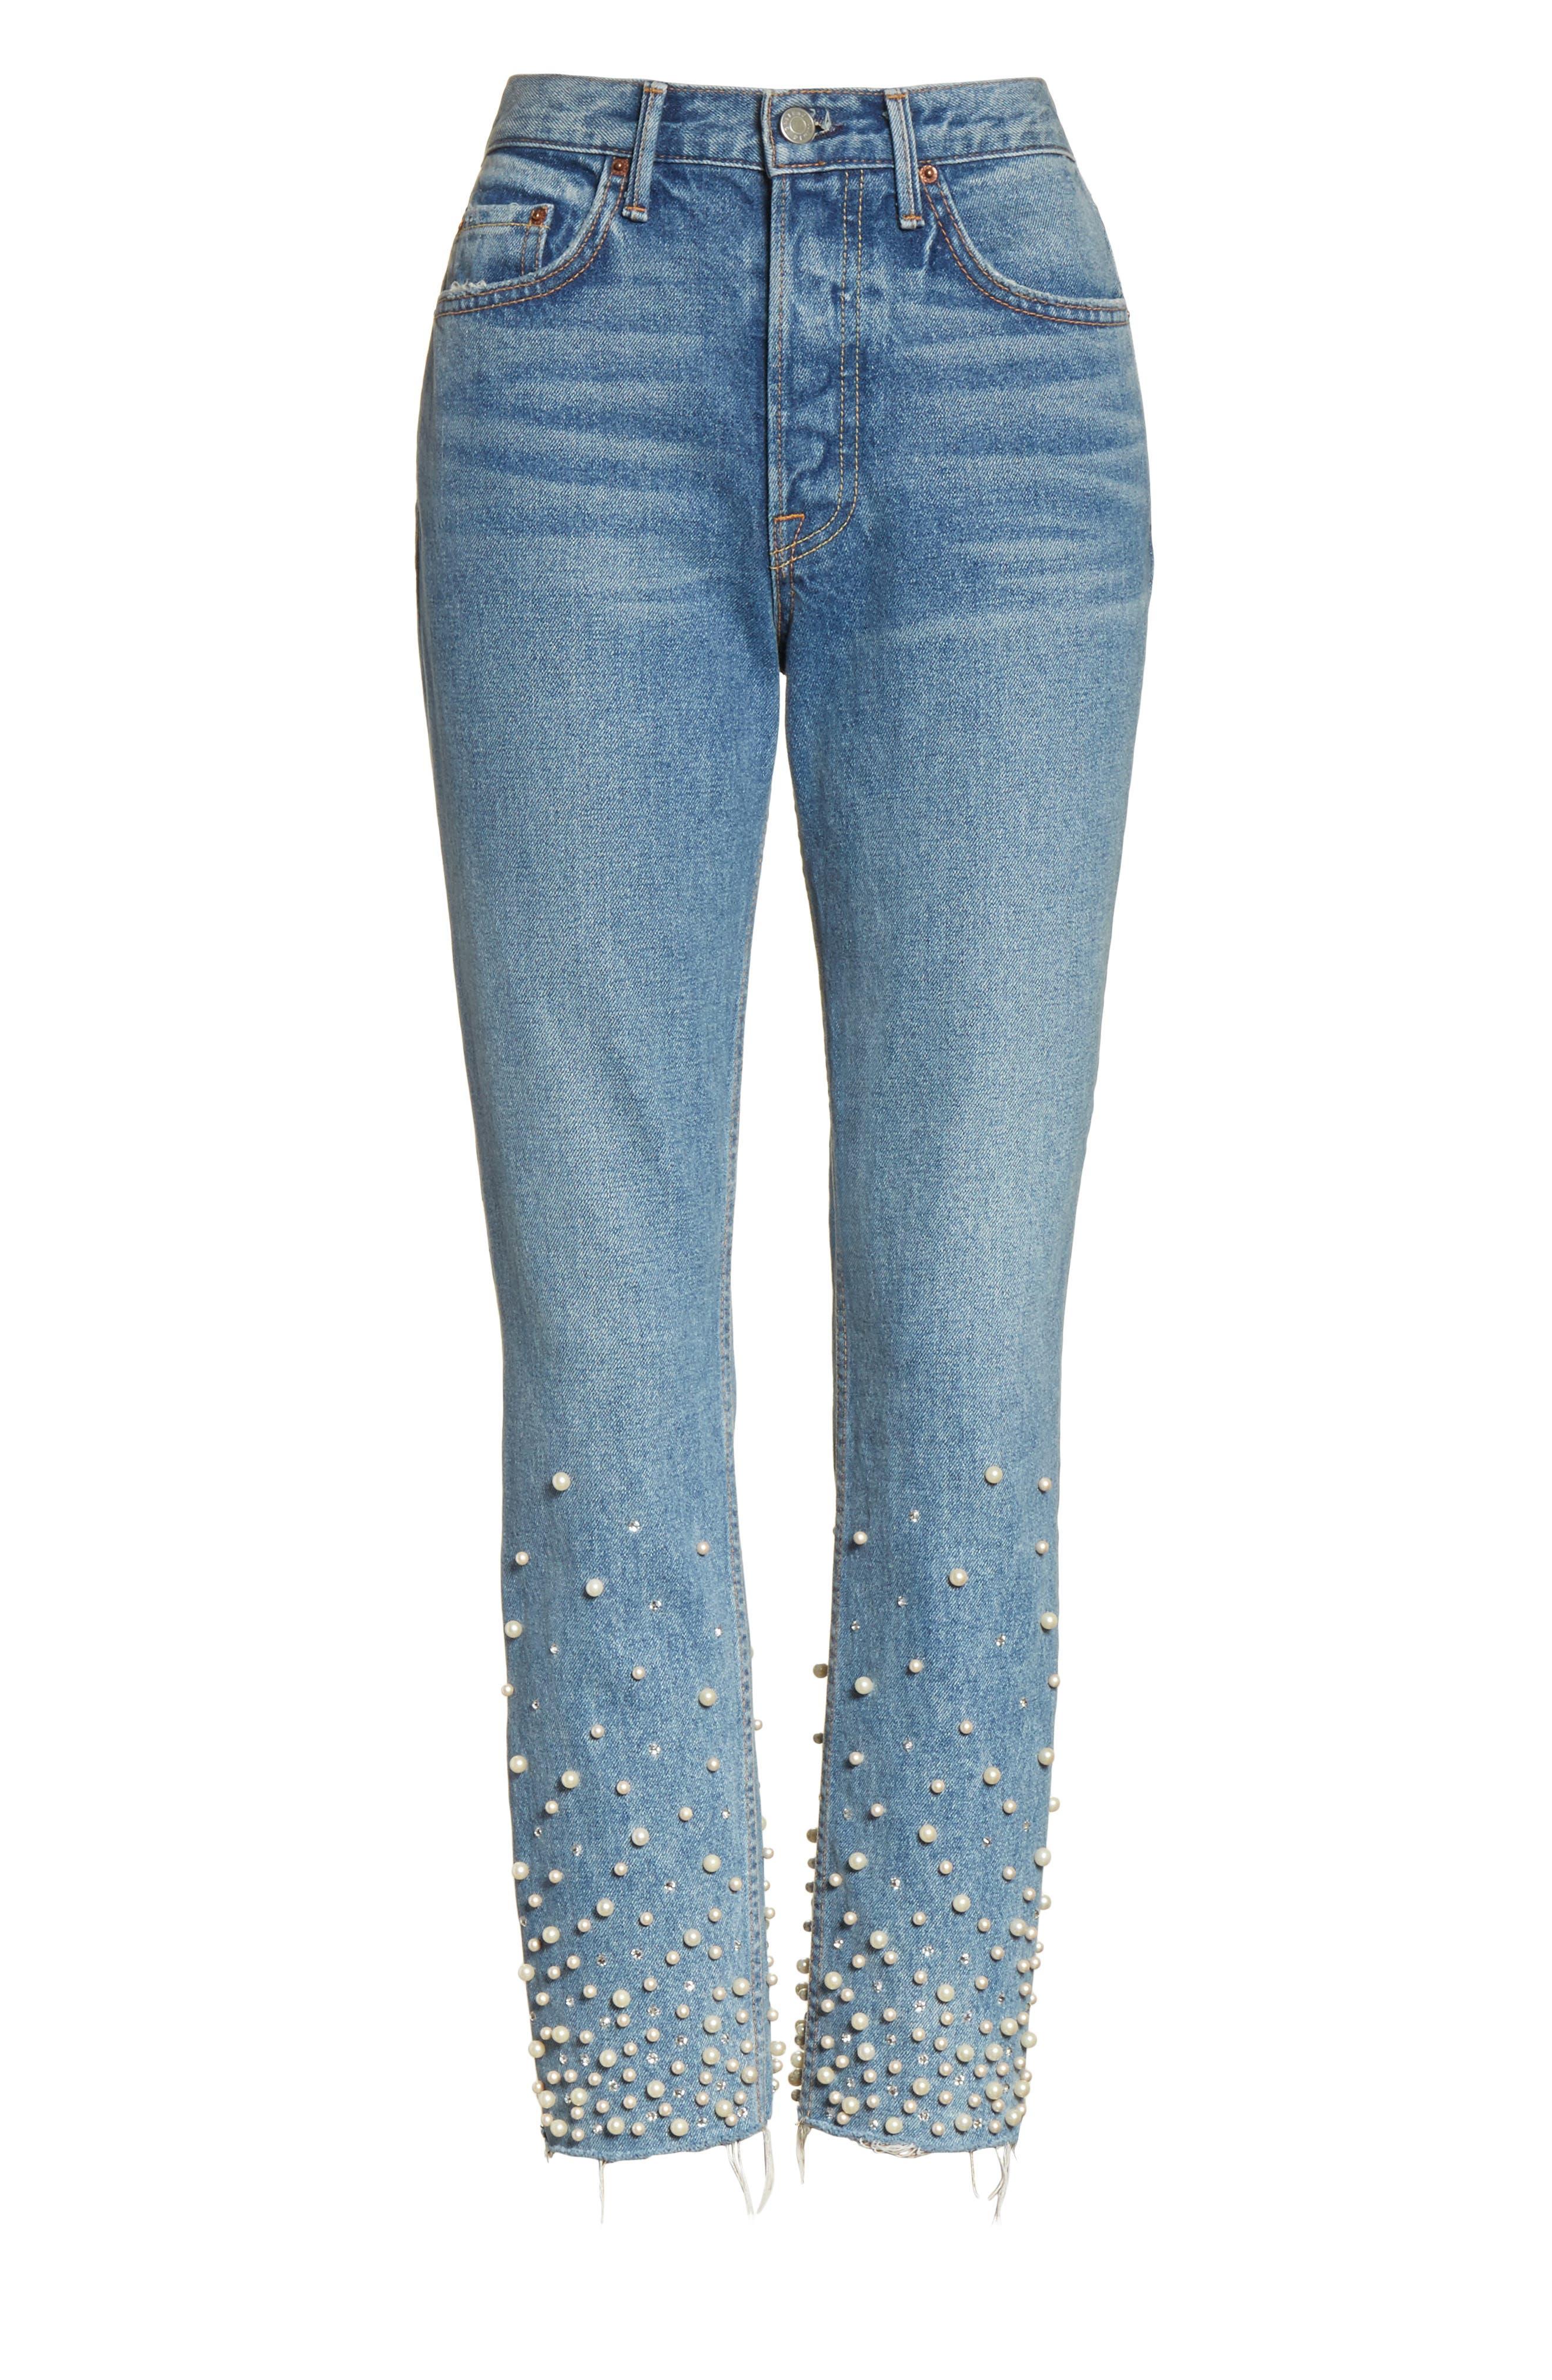 Karolina Faux Pearl & Crystal Embellished Rigid High Waist Skinny Jeans,                             Alternate thumbnail 6, color,                             493